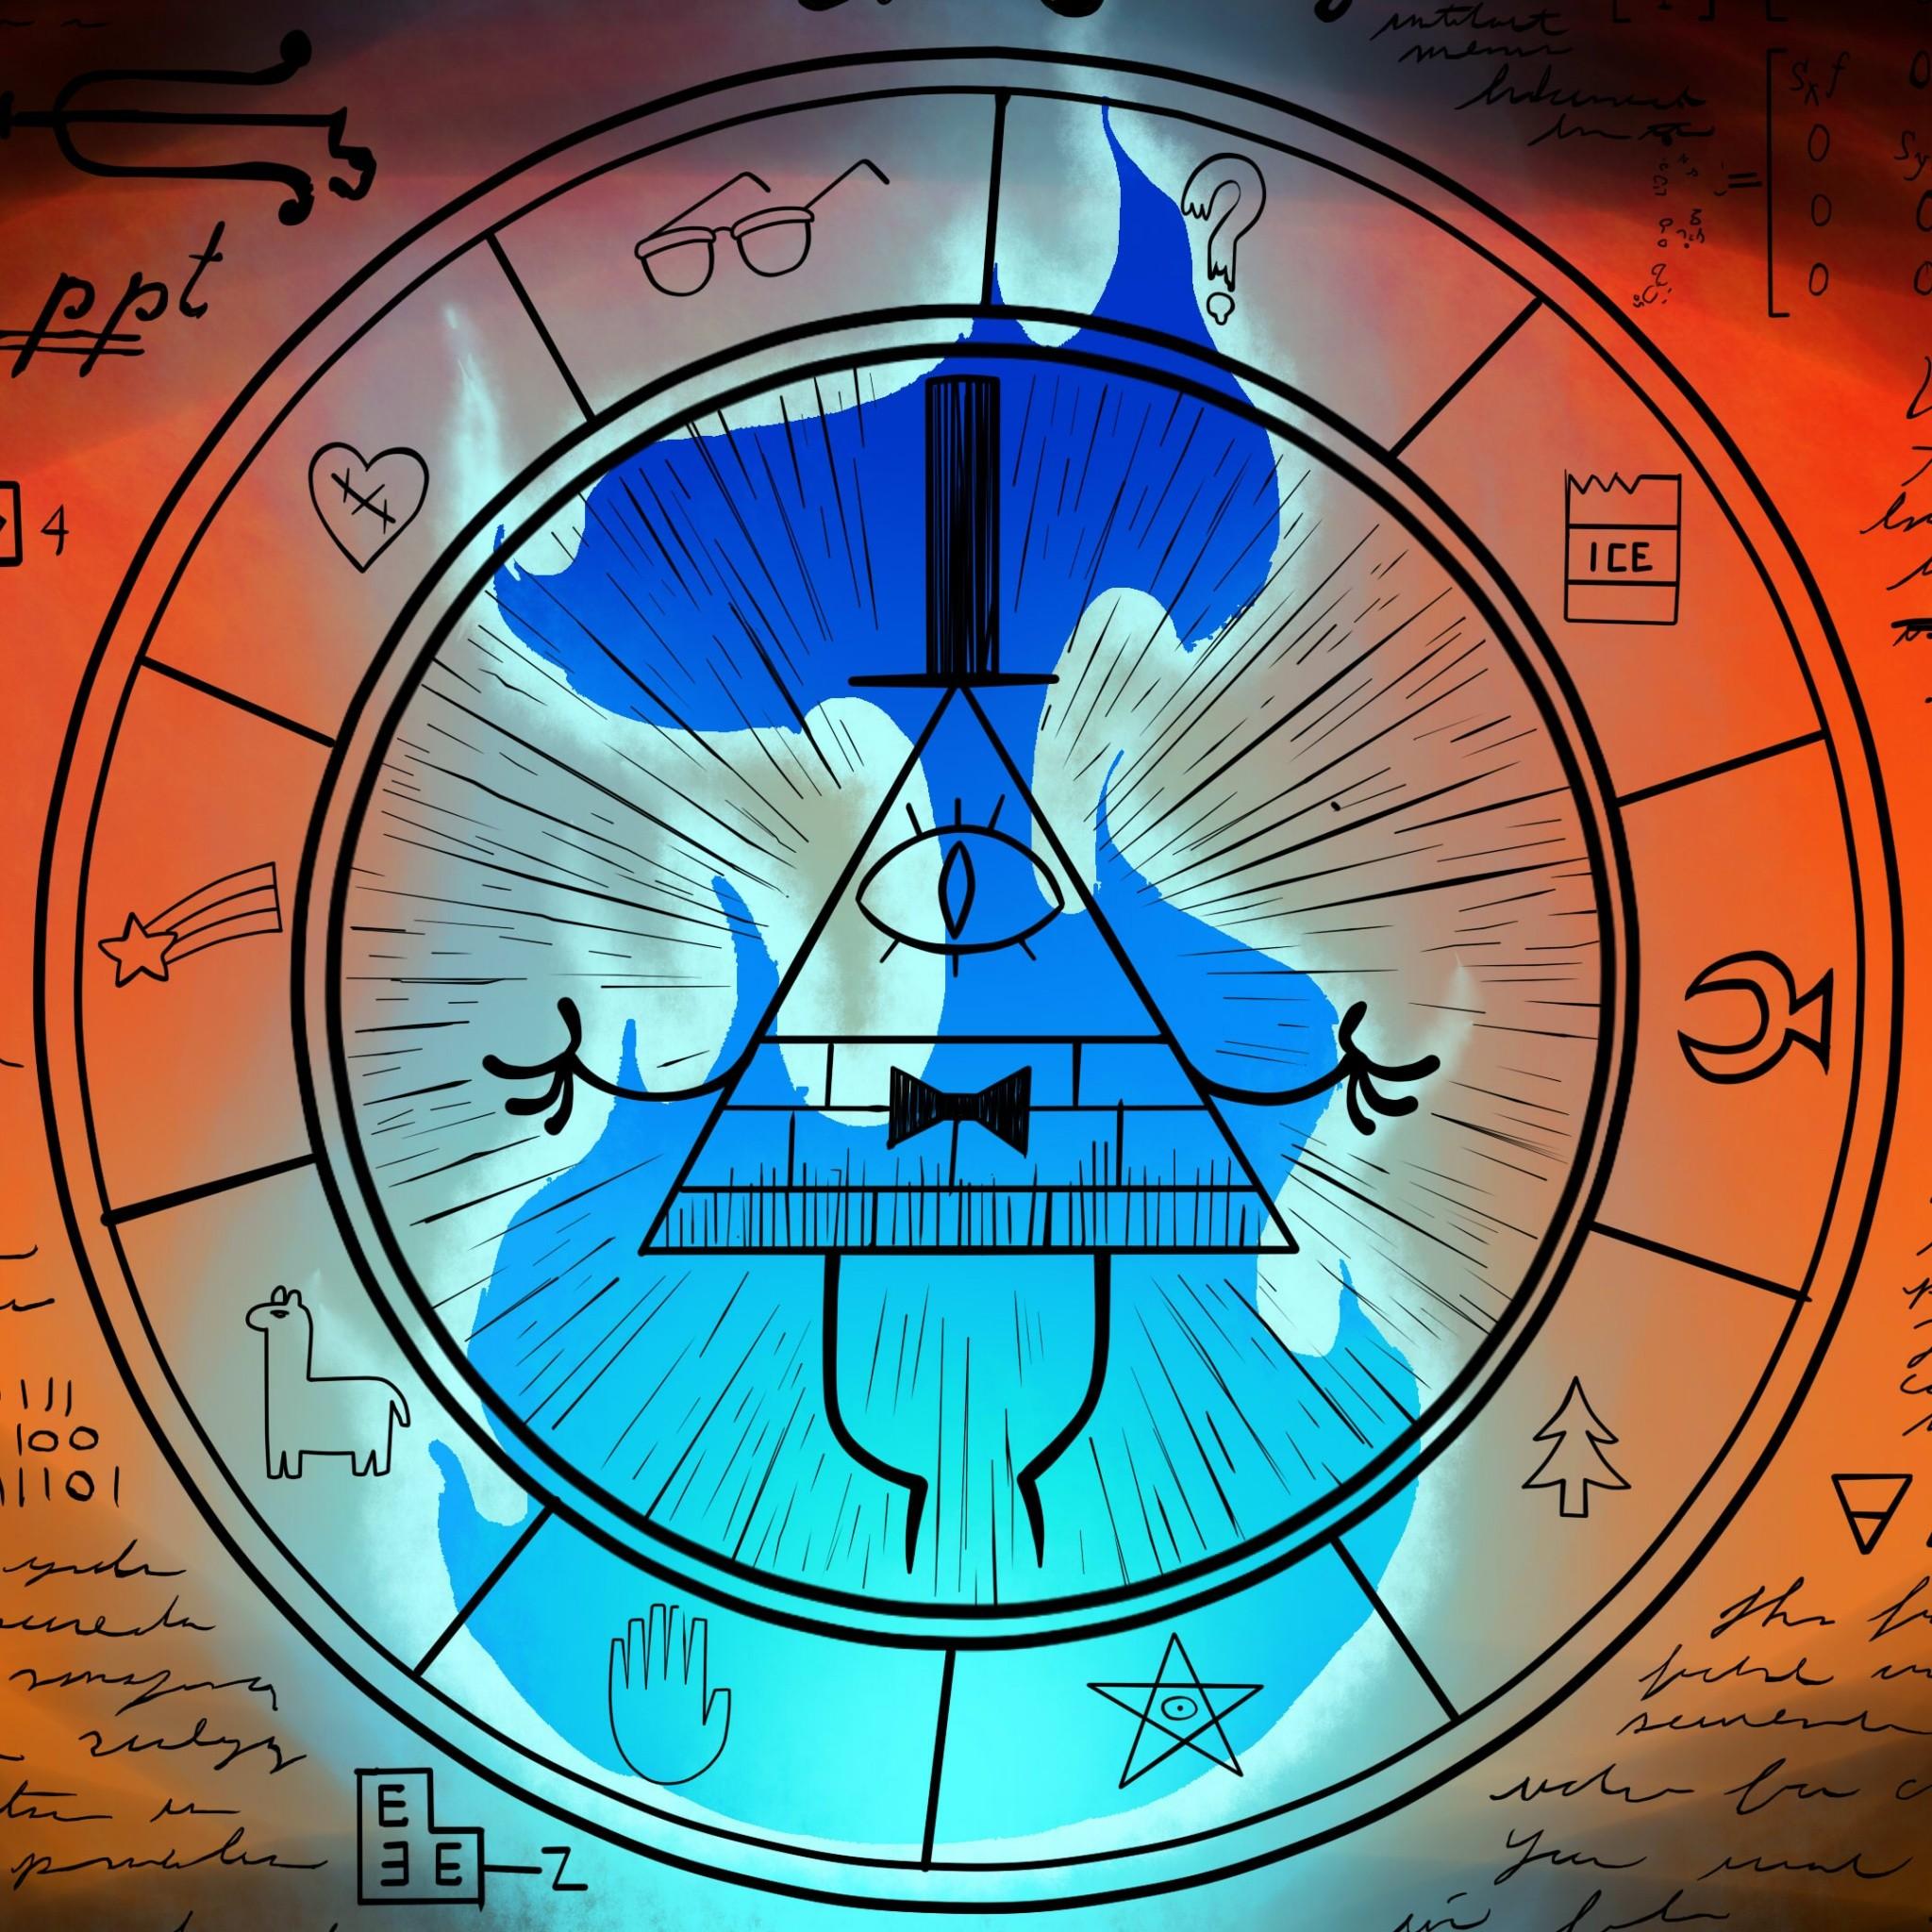 Download Bill Cipher Wheel Gravity Falls 2048 x 2048 Wallpapers – 4601564 –  gravity falls animation bill cipher | mobile9